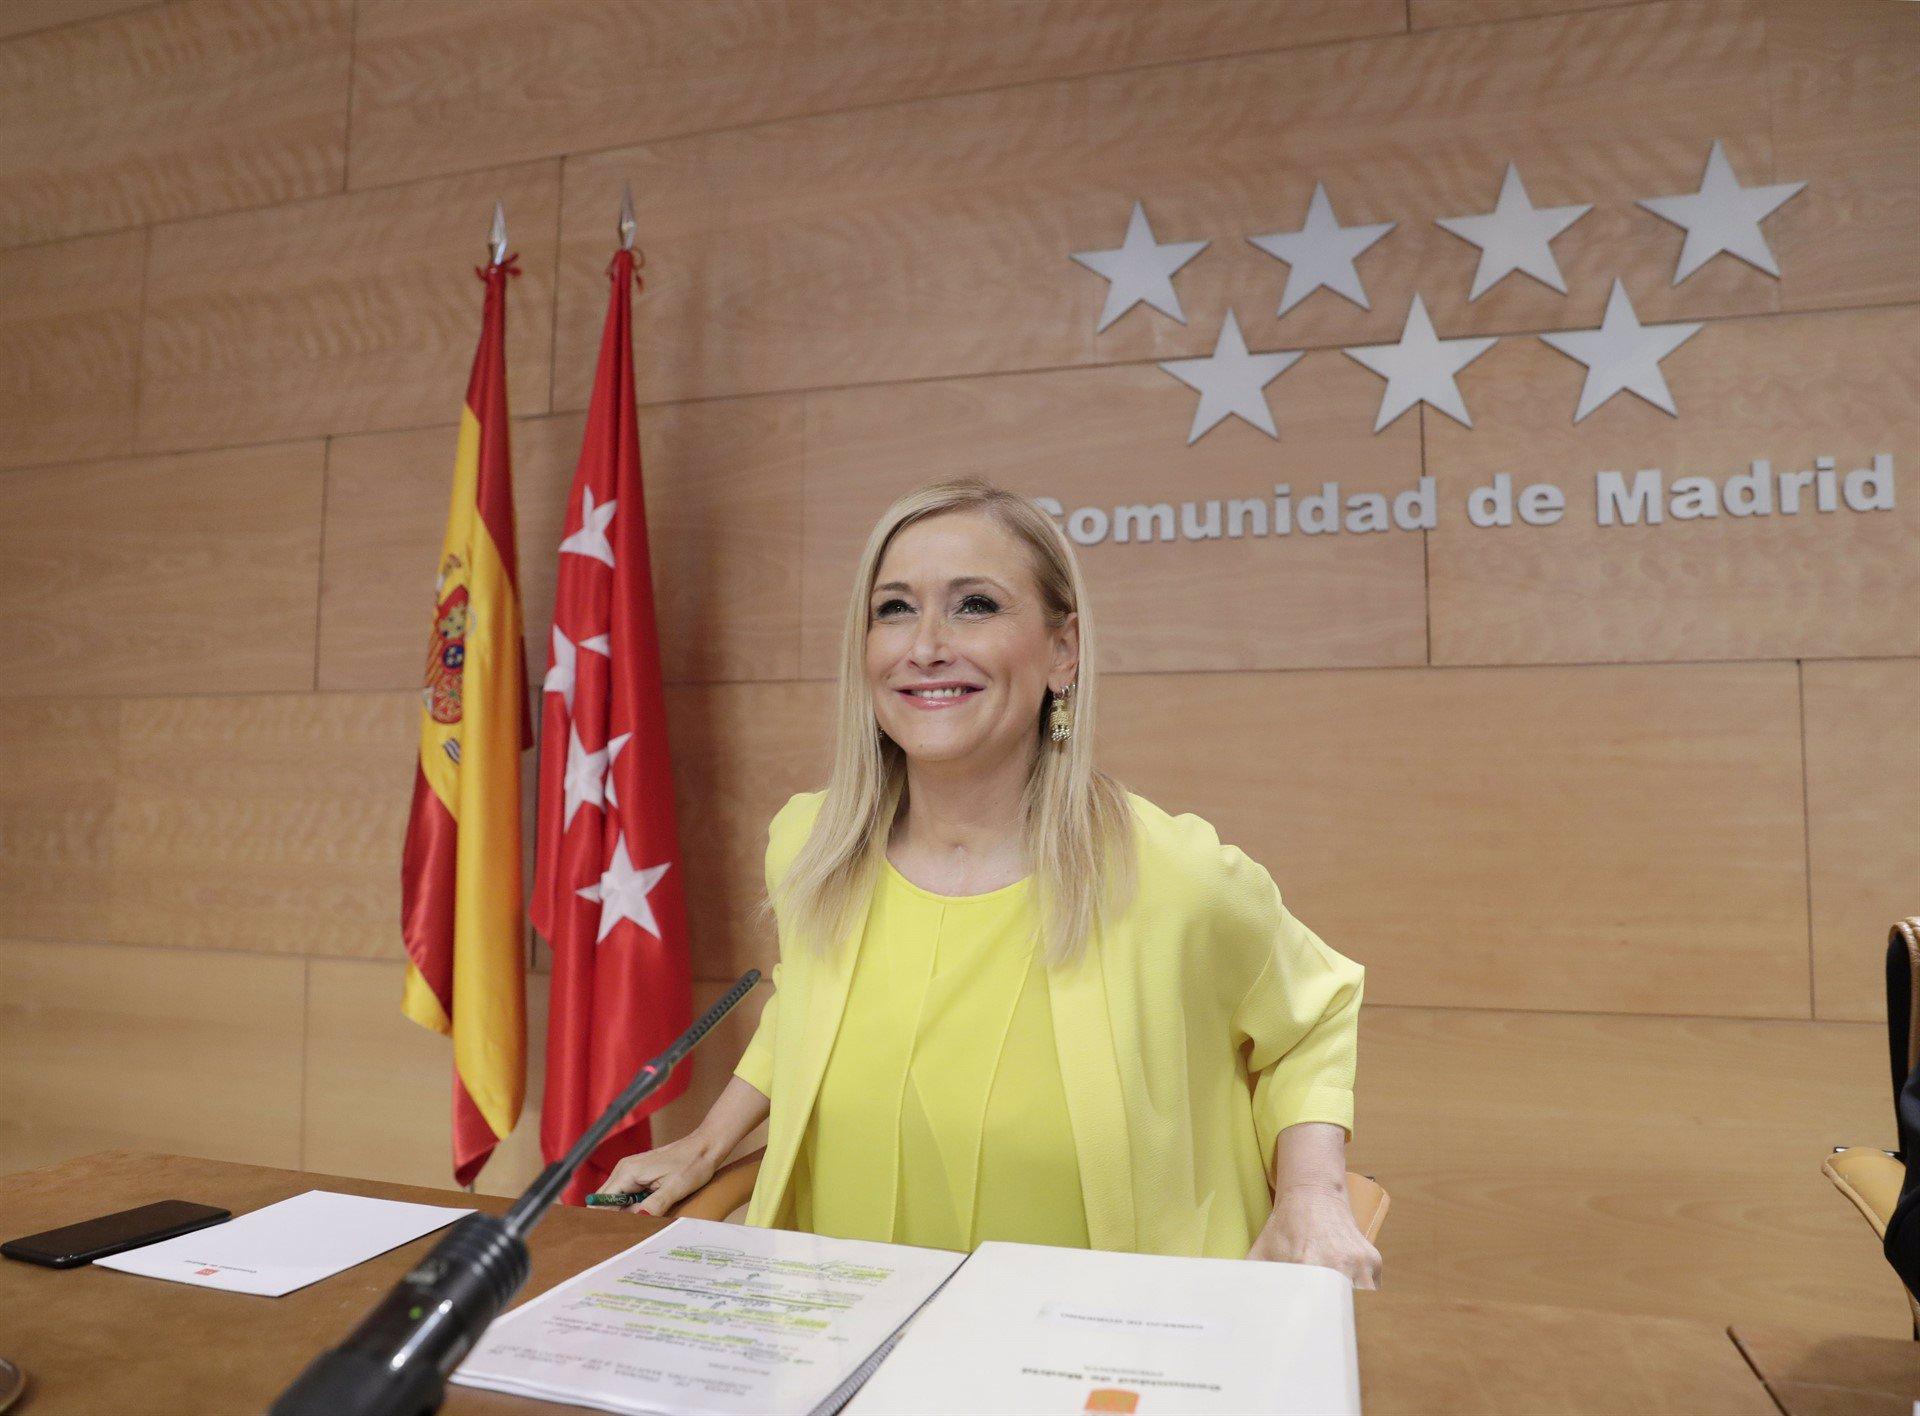 https://img.europapress.es/fotoweb/fotonoticia_20170808153437_1920.jpg